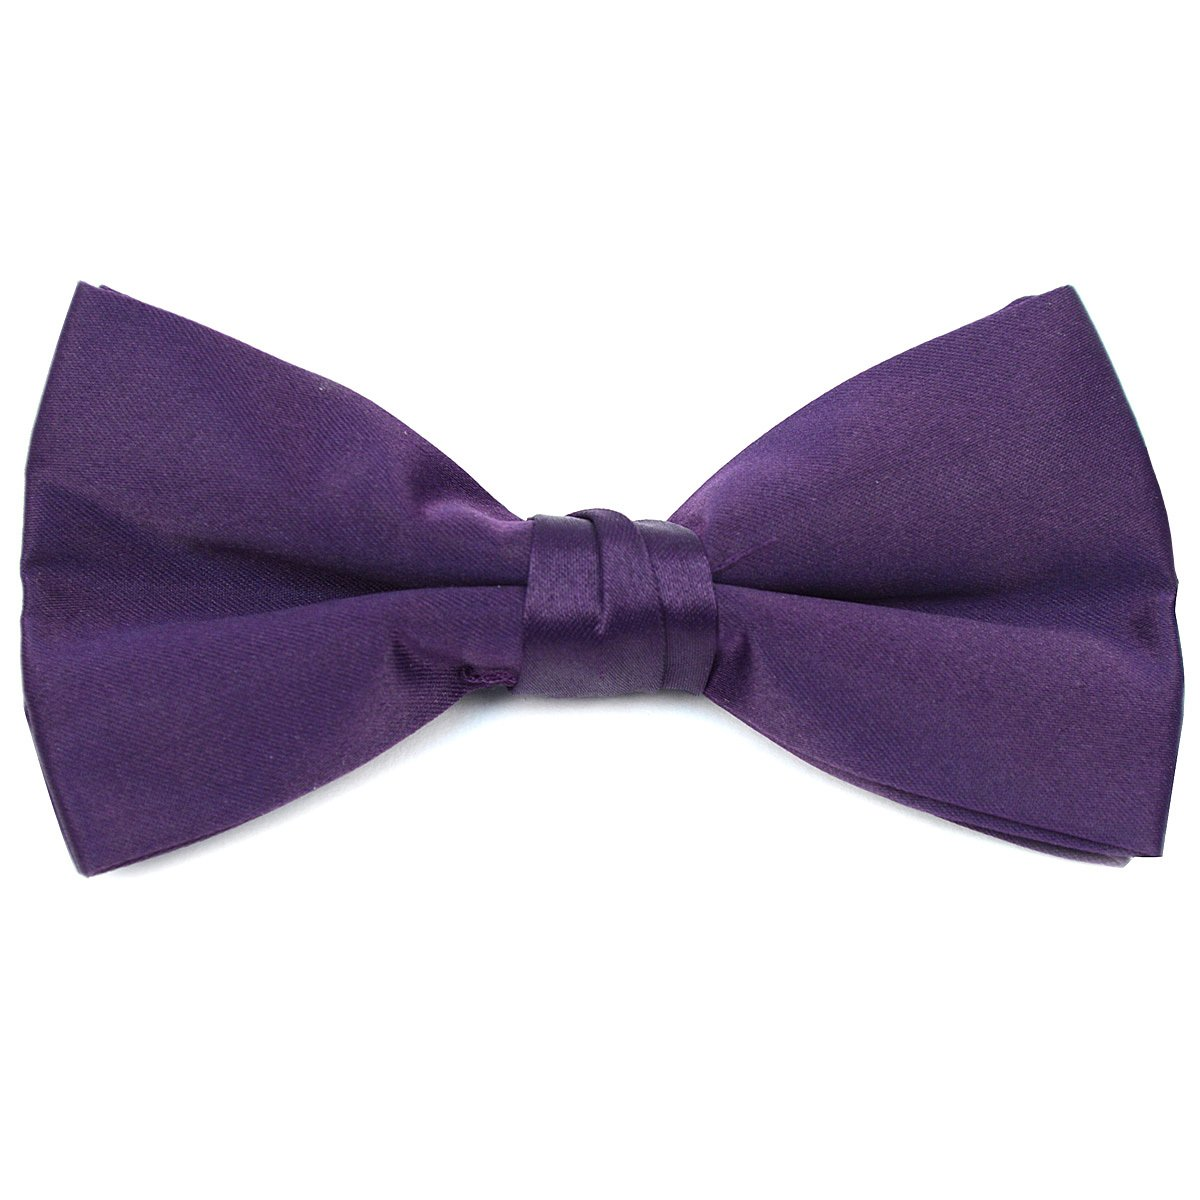 Formal Solid Polyester Boys Bow Tie-Dark Purple